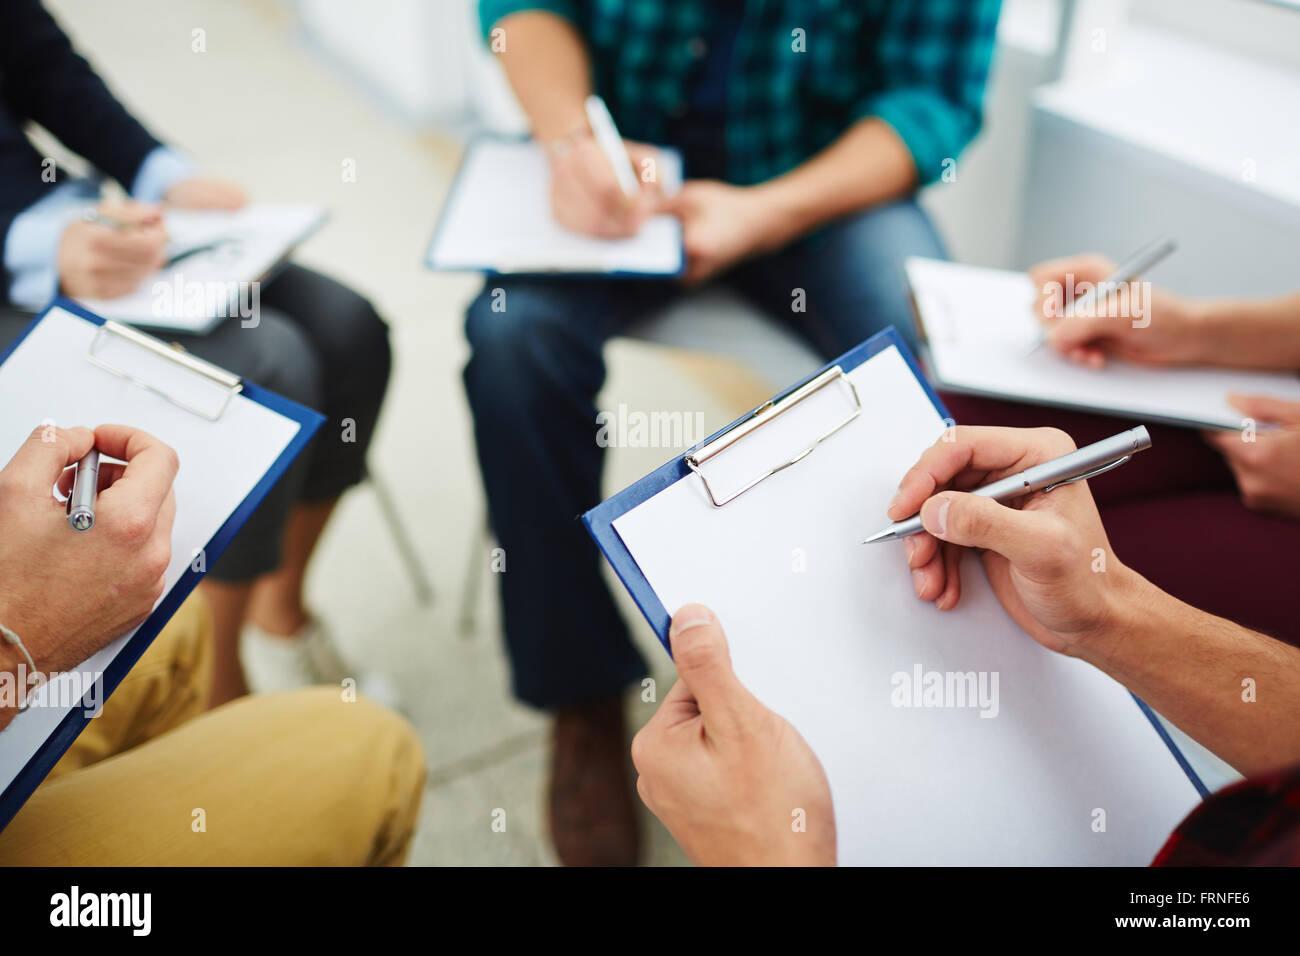 Writing down ideas - Stock Image